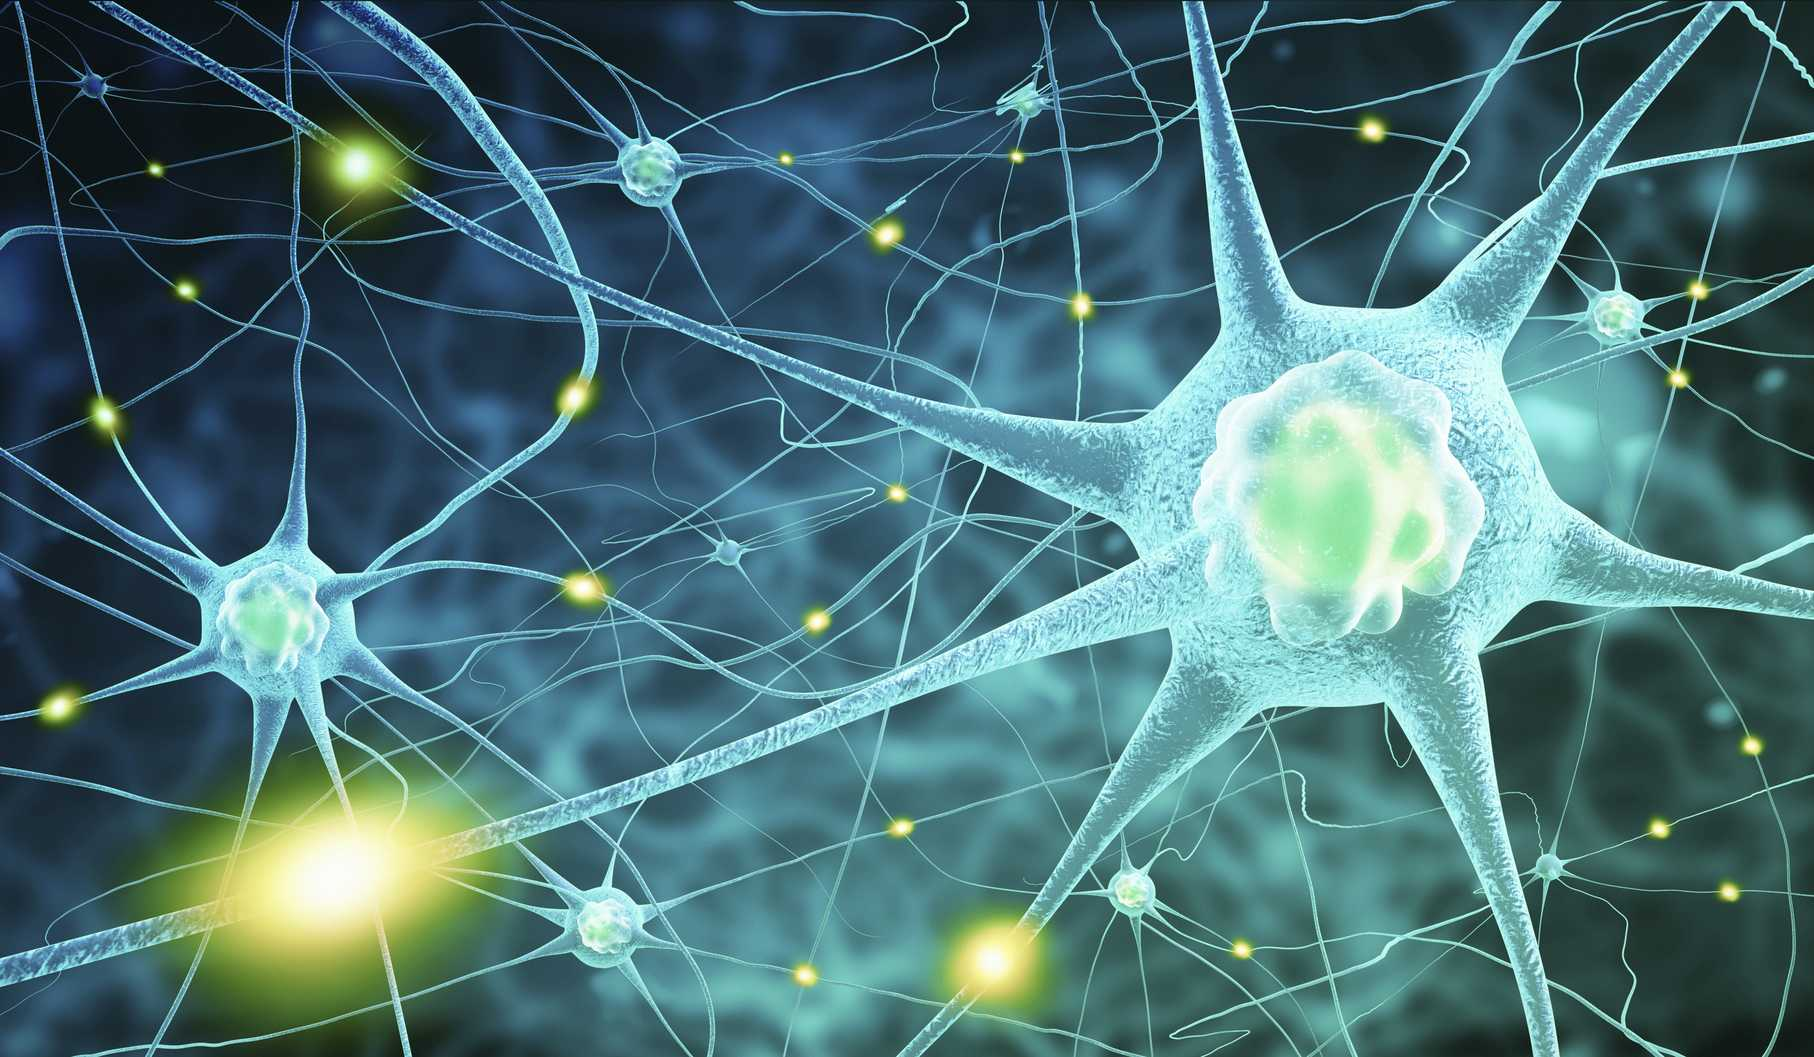 Diabetic Neuropathy - Types, Causes, Symptoms & Prevention